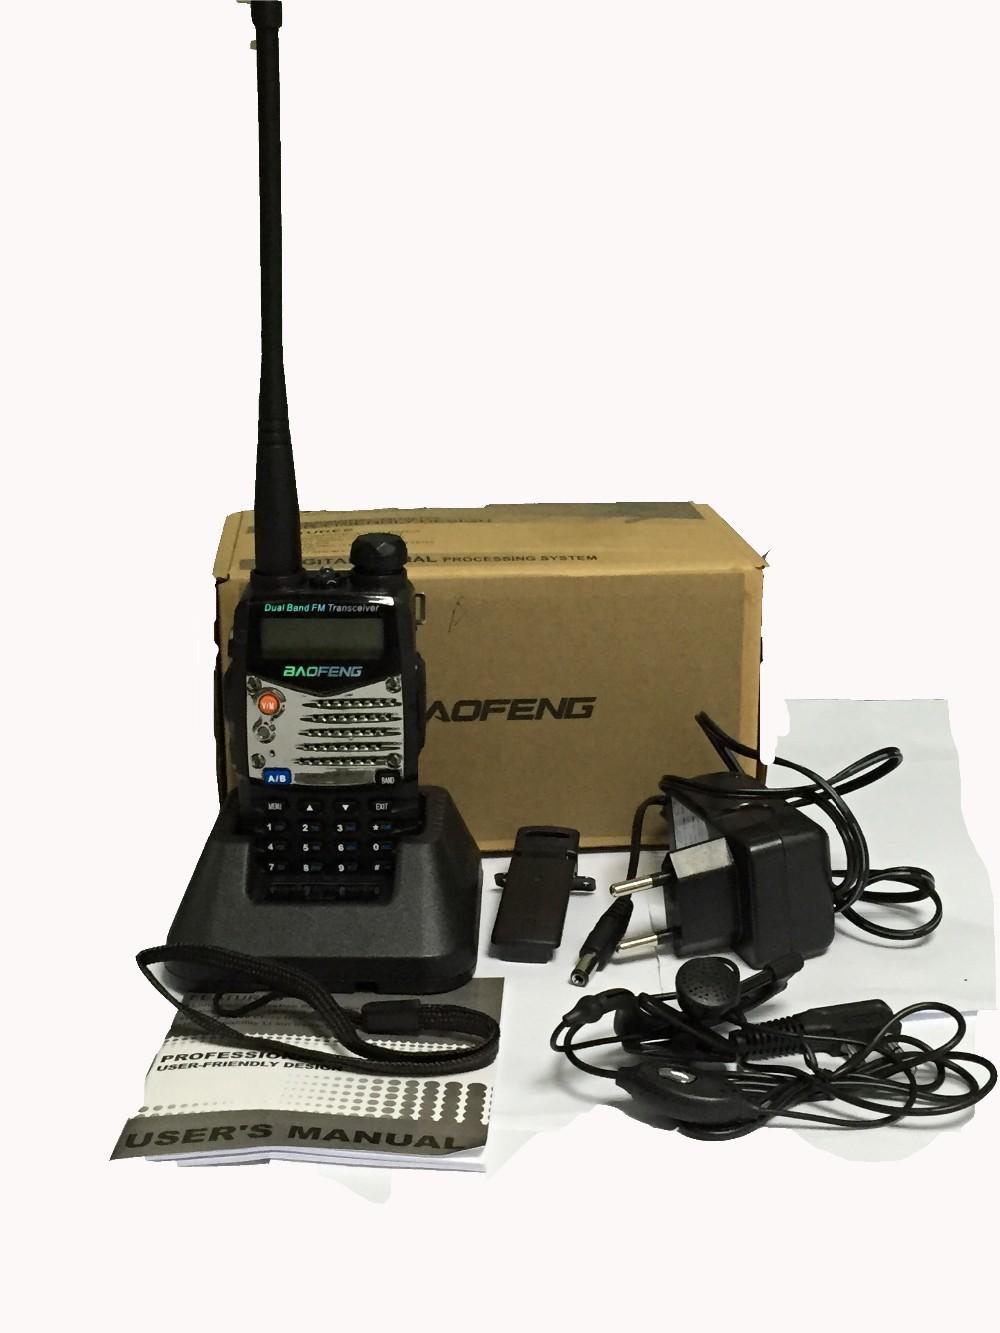 New Waterproof Pofung Baofeng UV-5RA For Police Walkie Talkies Scanner Radio Vhf Uhf Dual Band Cb Ham Radio Transceiver 136-174 (16)